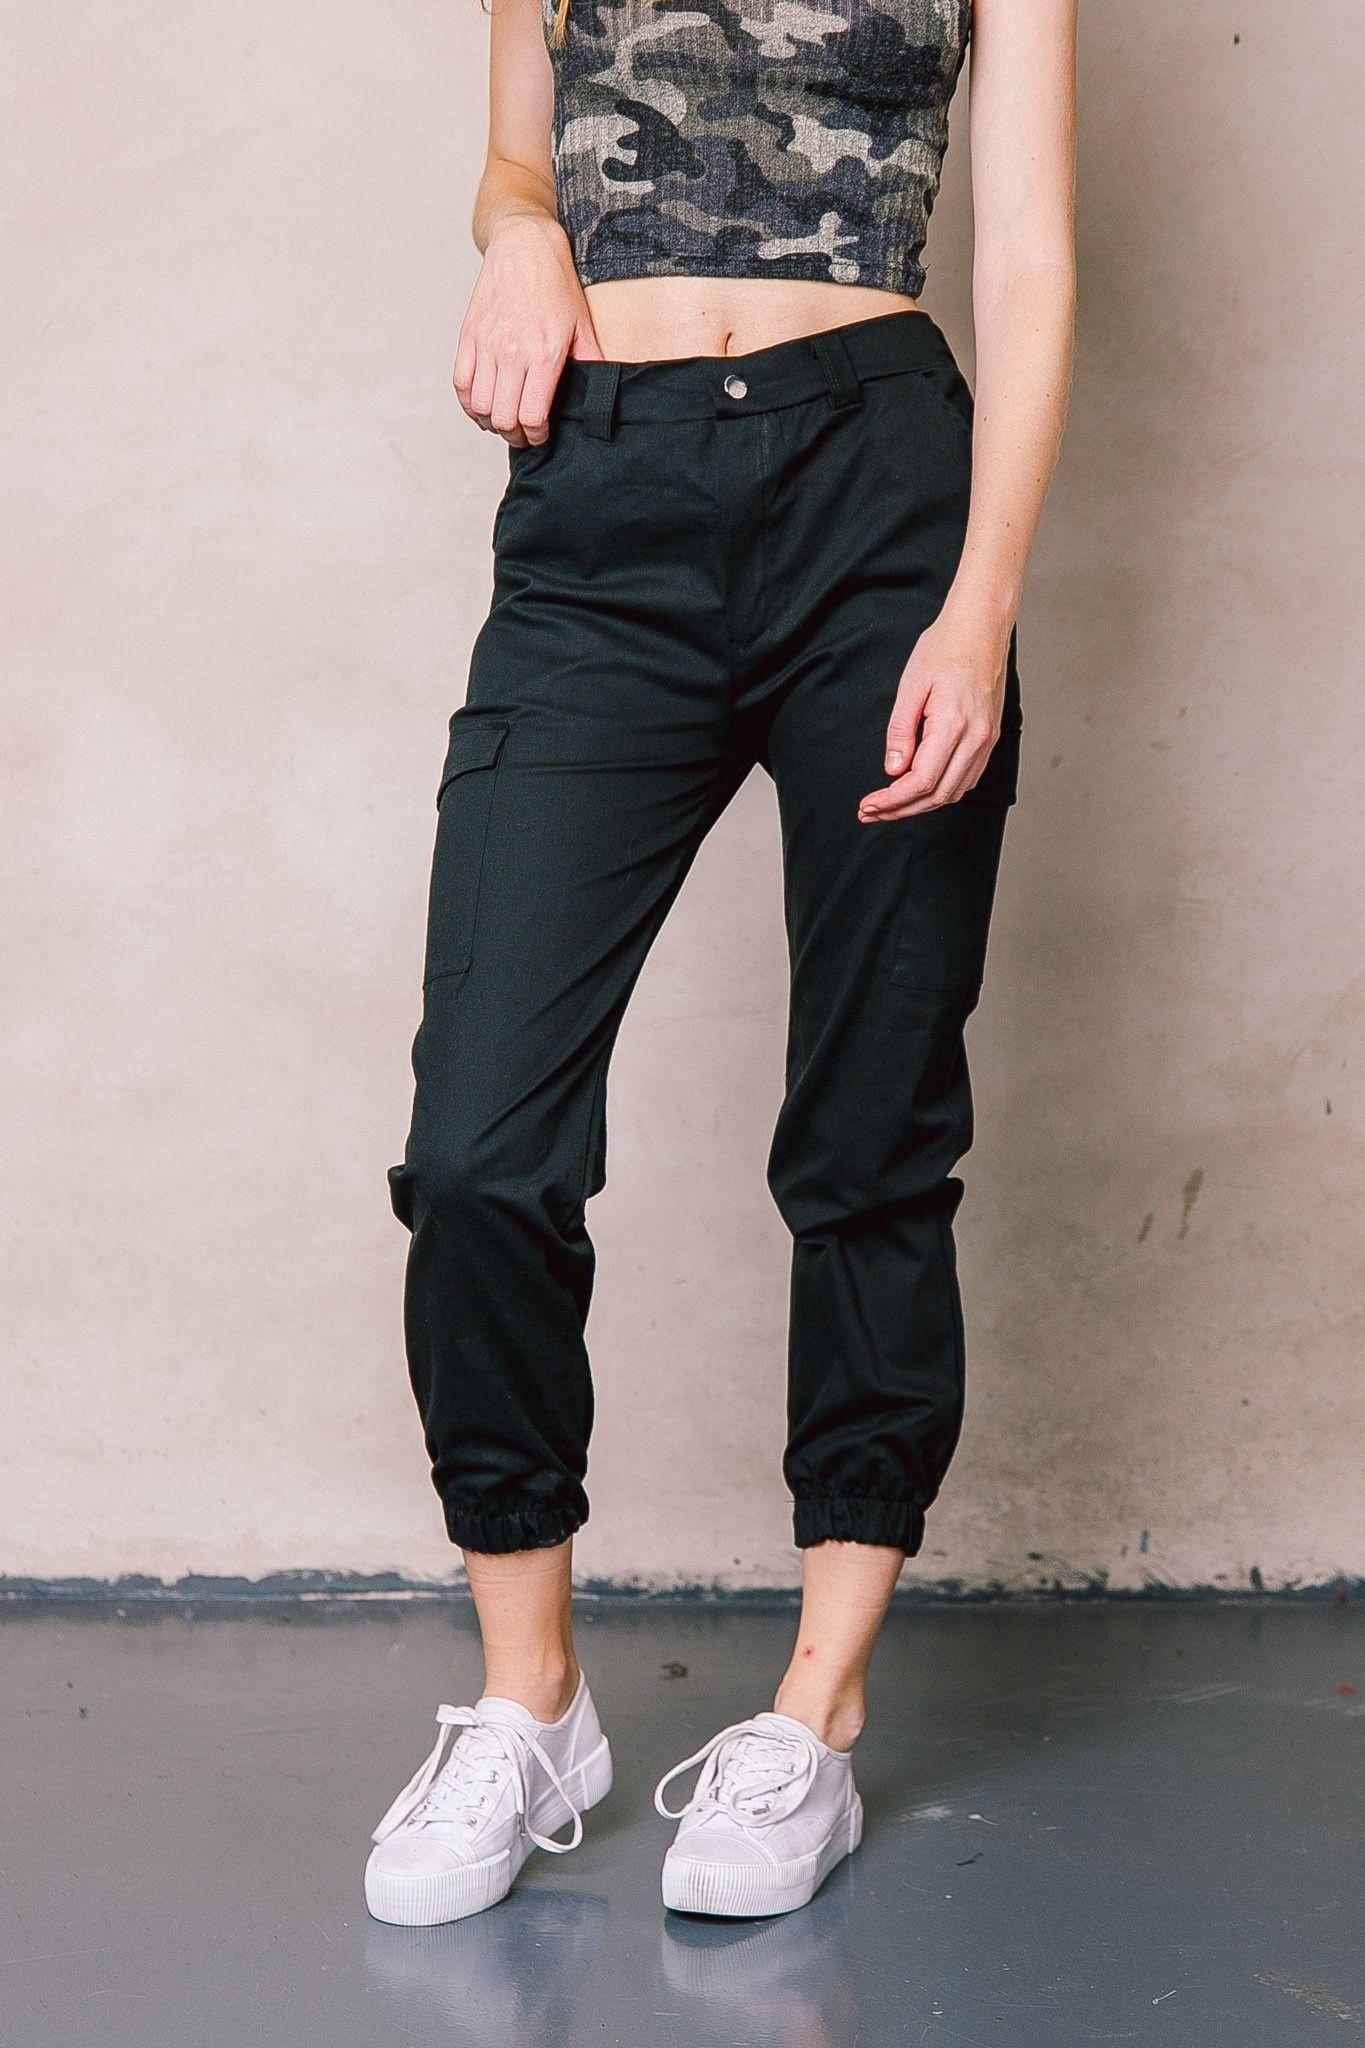 19inp030 Pantalon Cargo Nina Pantalones Cargo Mujer Pantalones De Moda Ropa